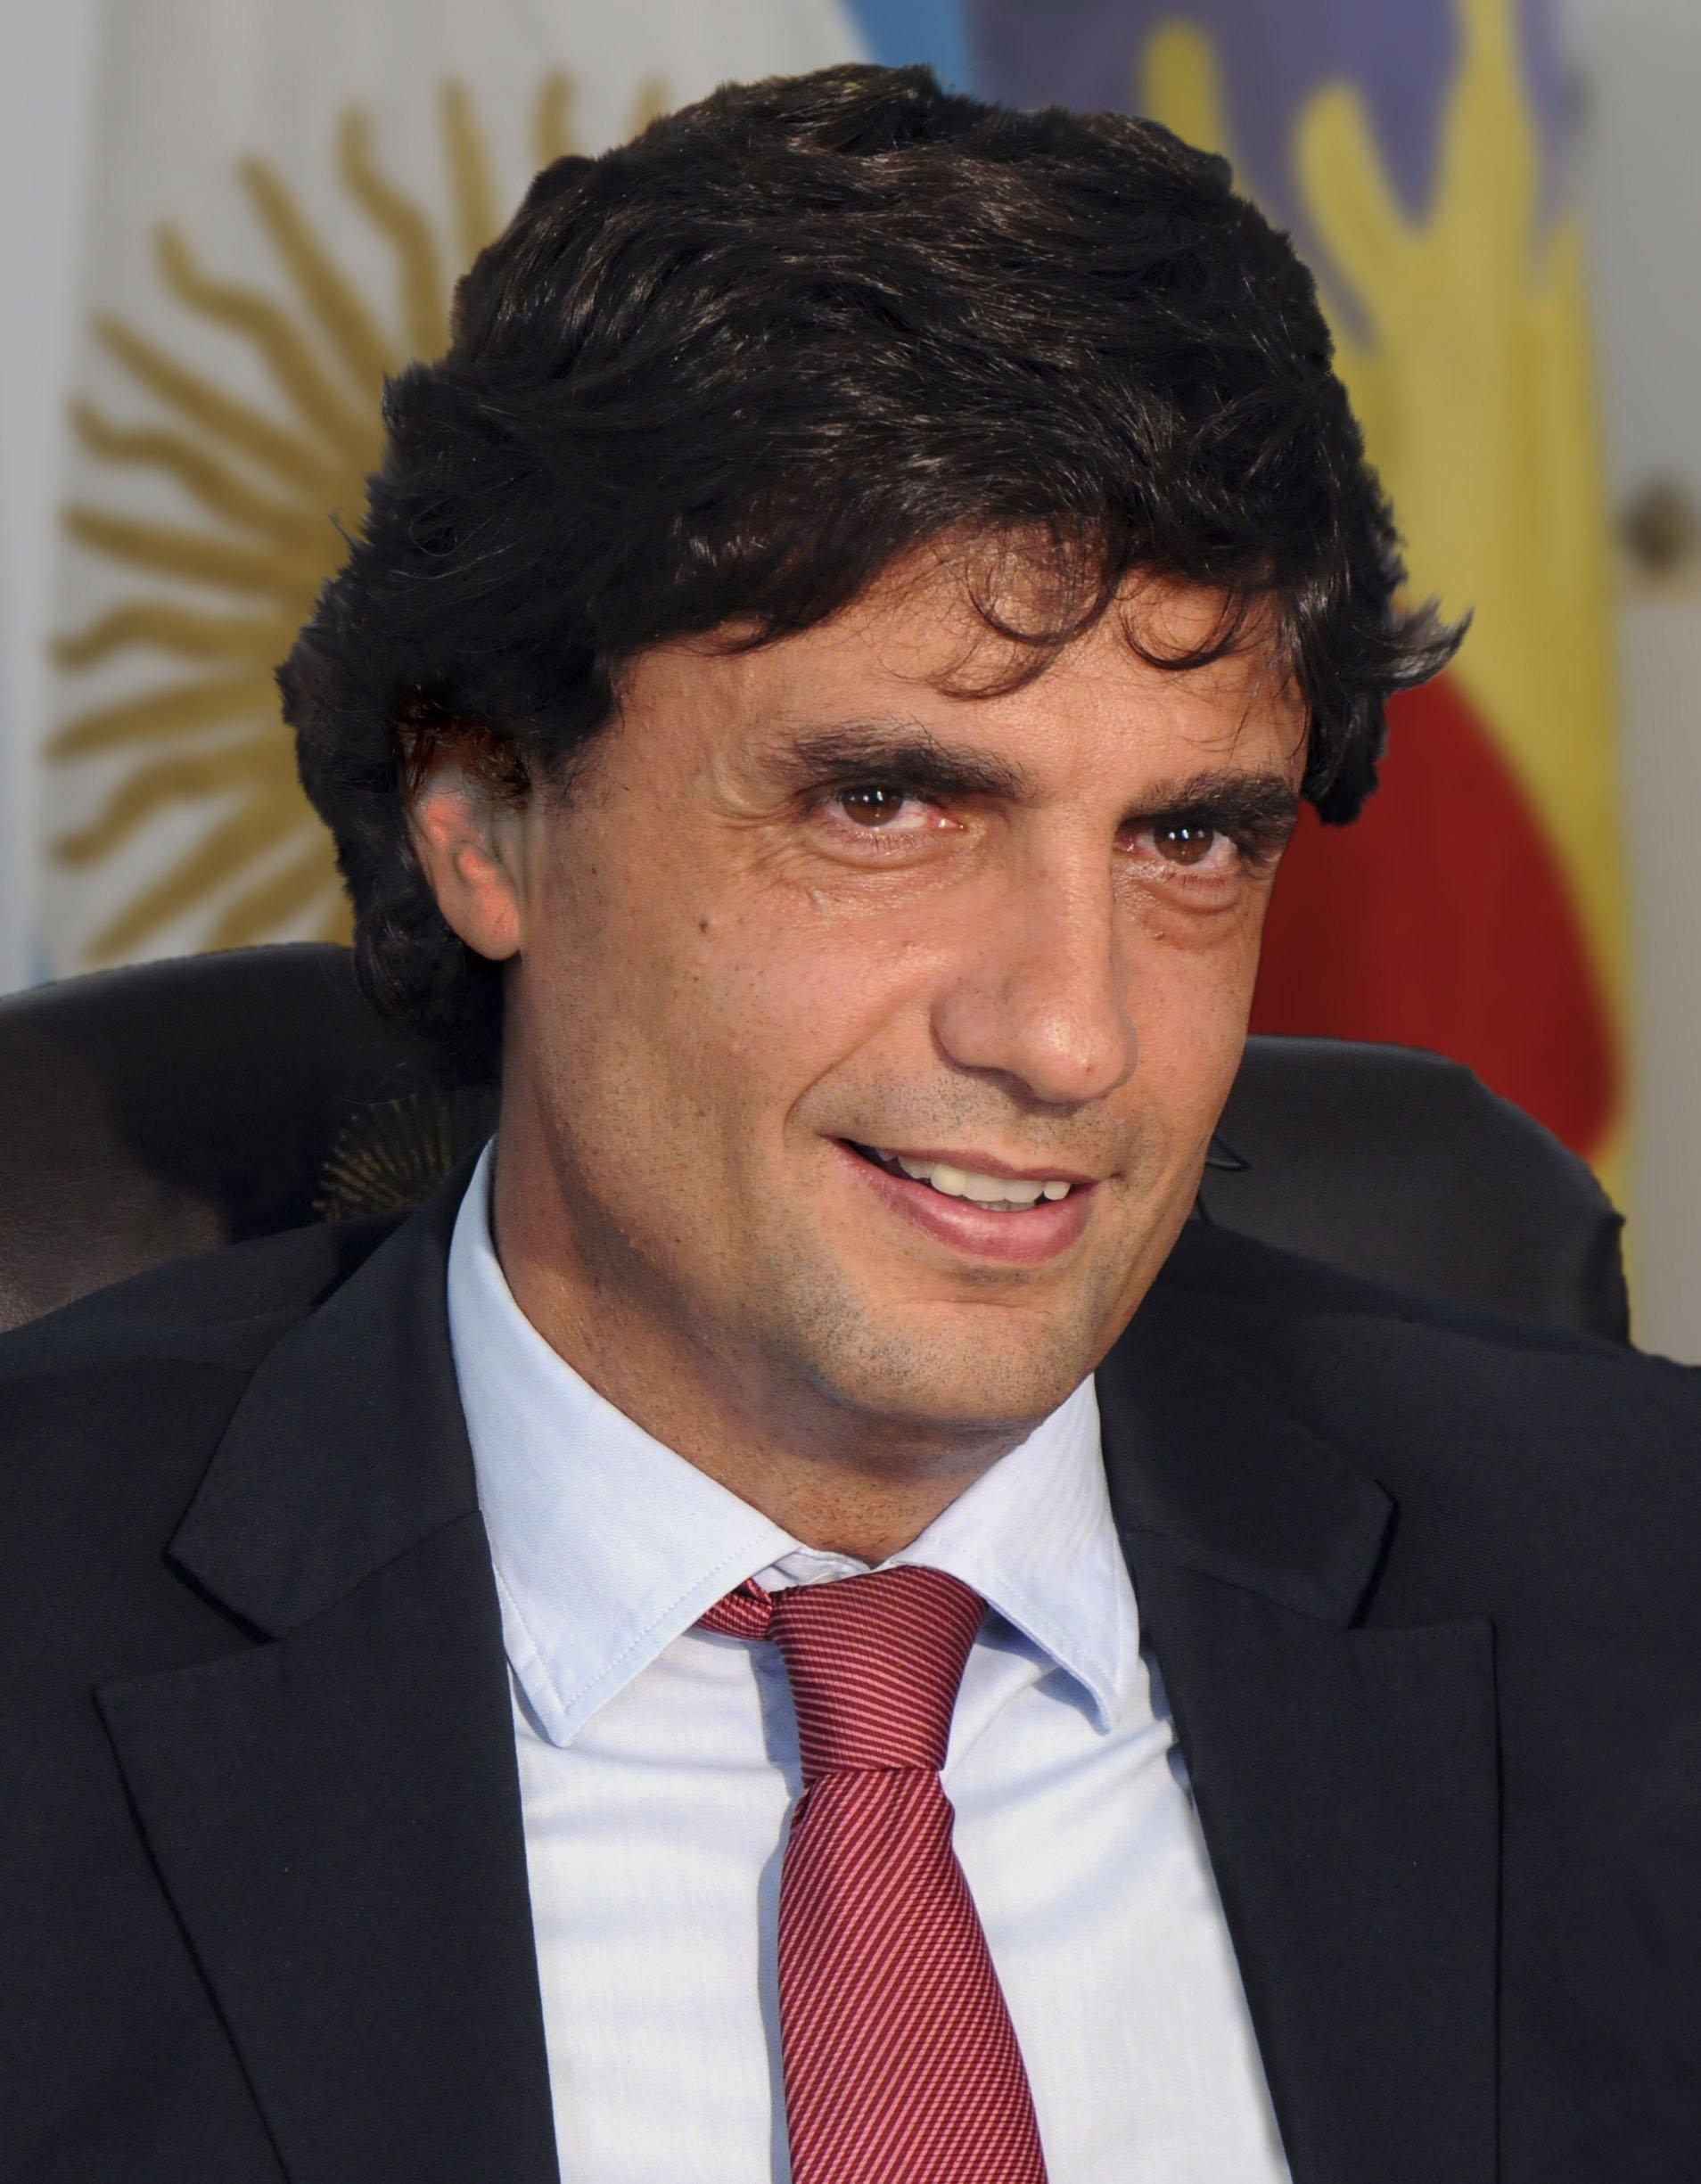 Hernán Lacunza Guido Sandleris Mauricio Macri FMI Banco Central Christine Lagarde